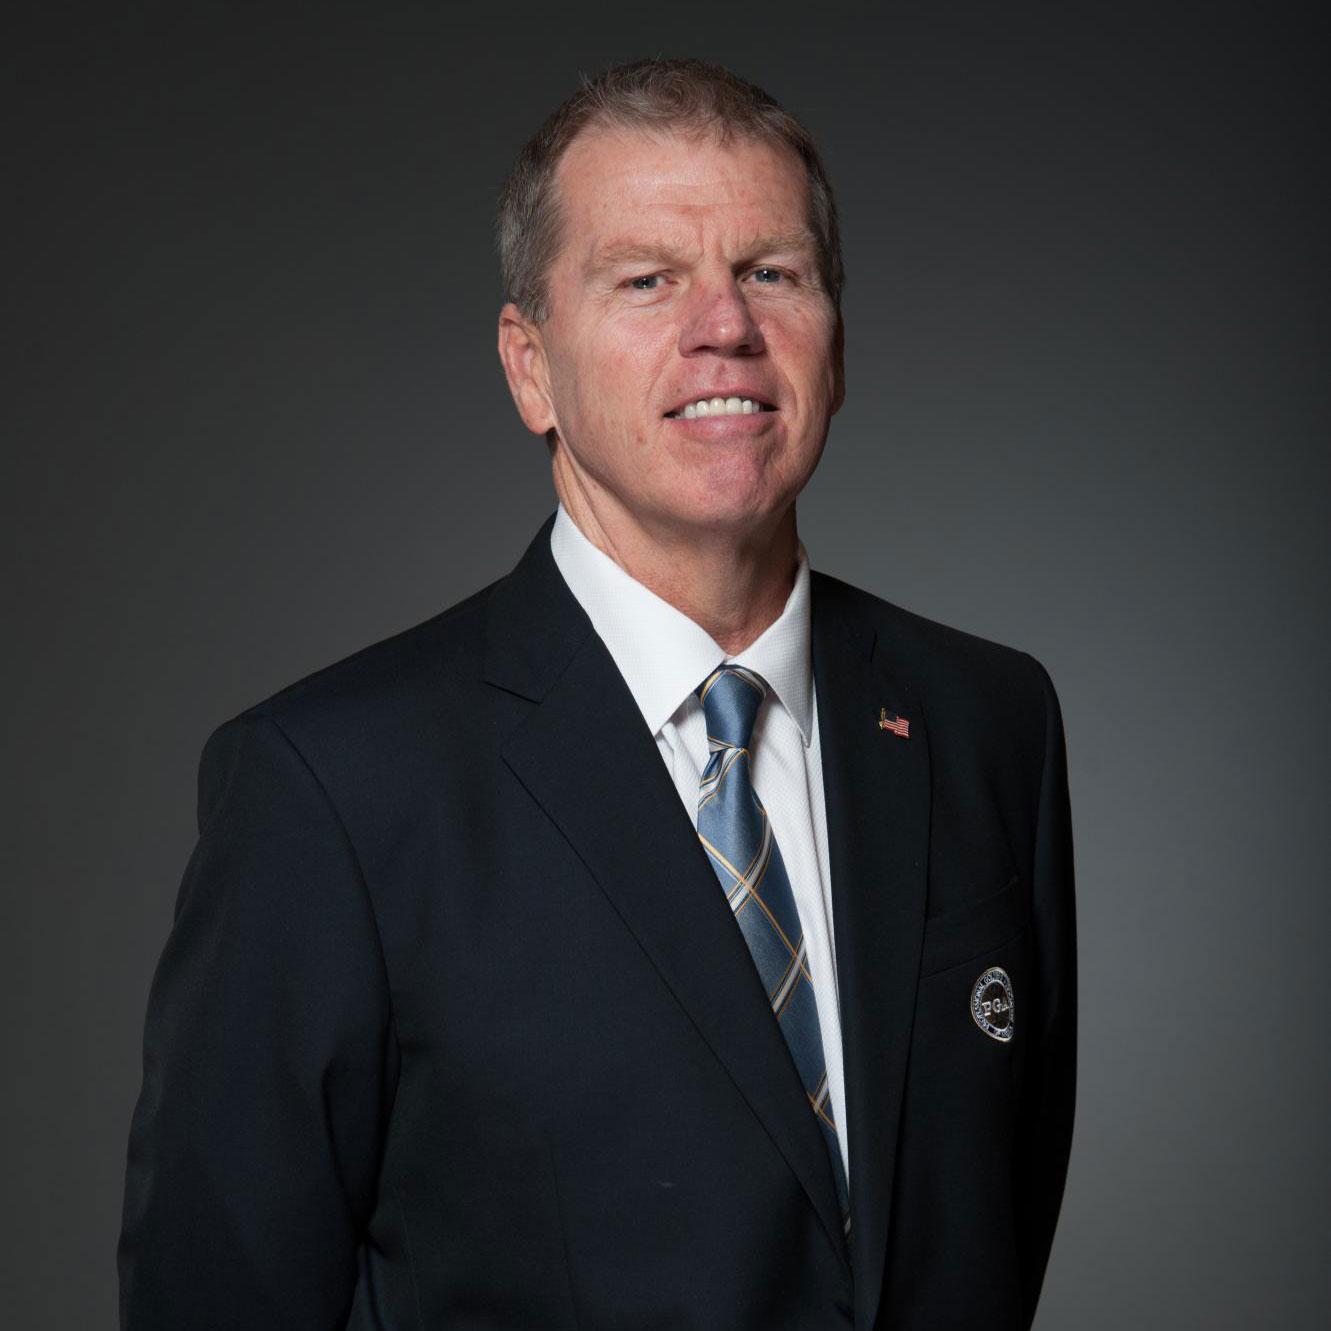 PGA Image